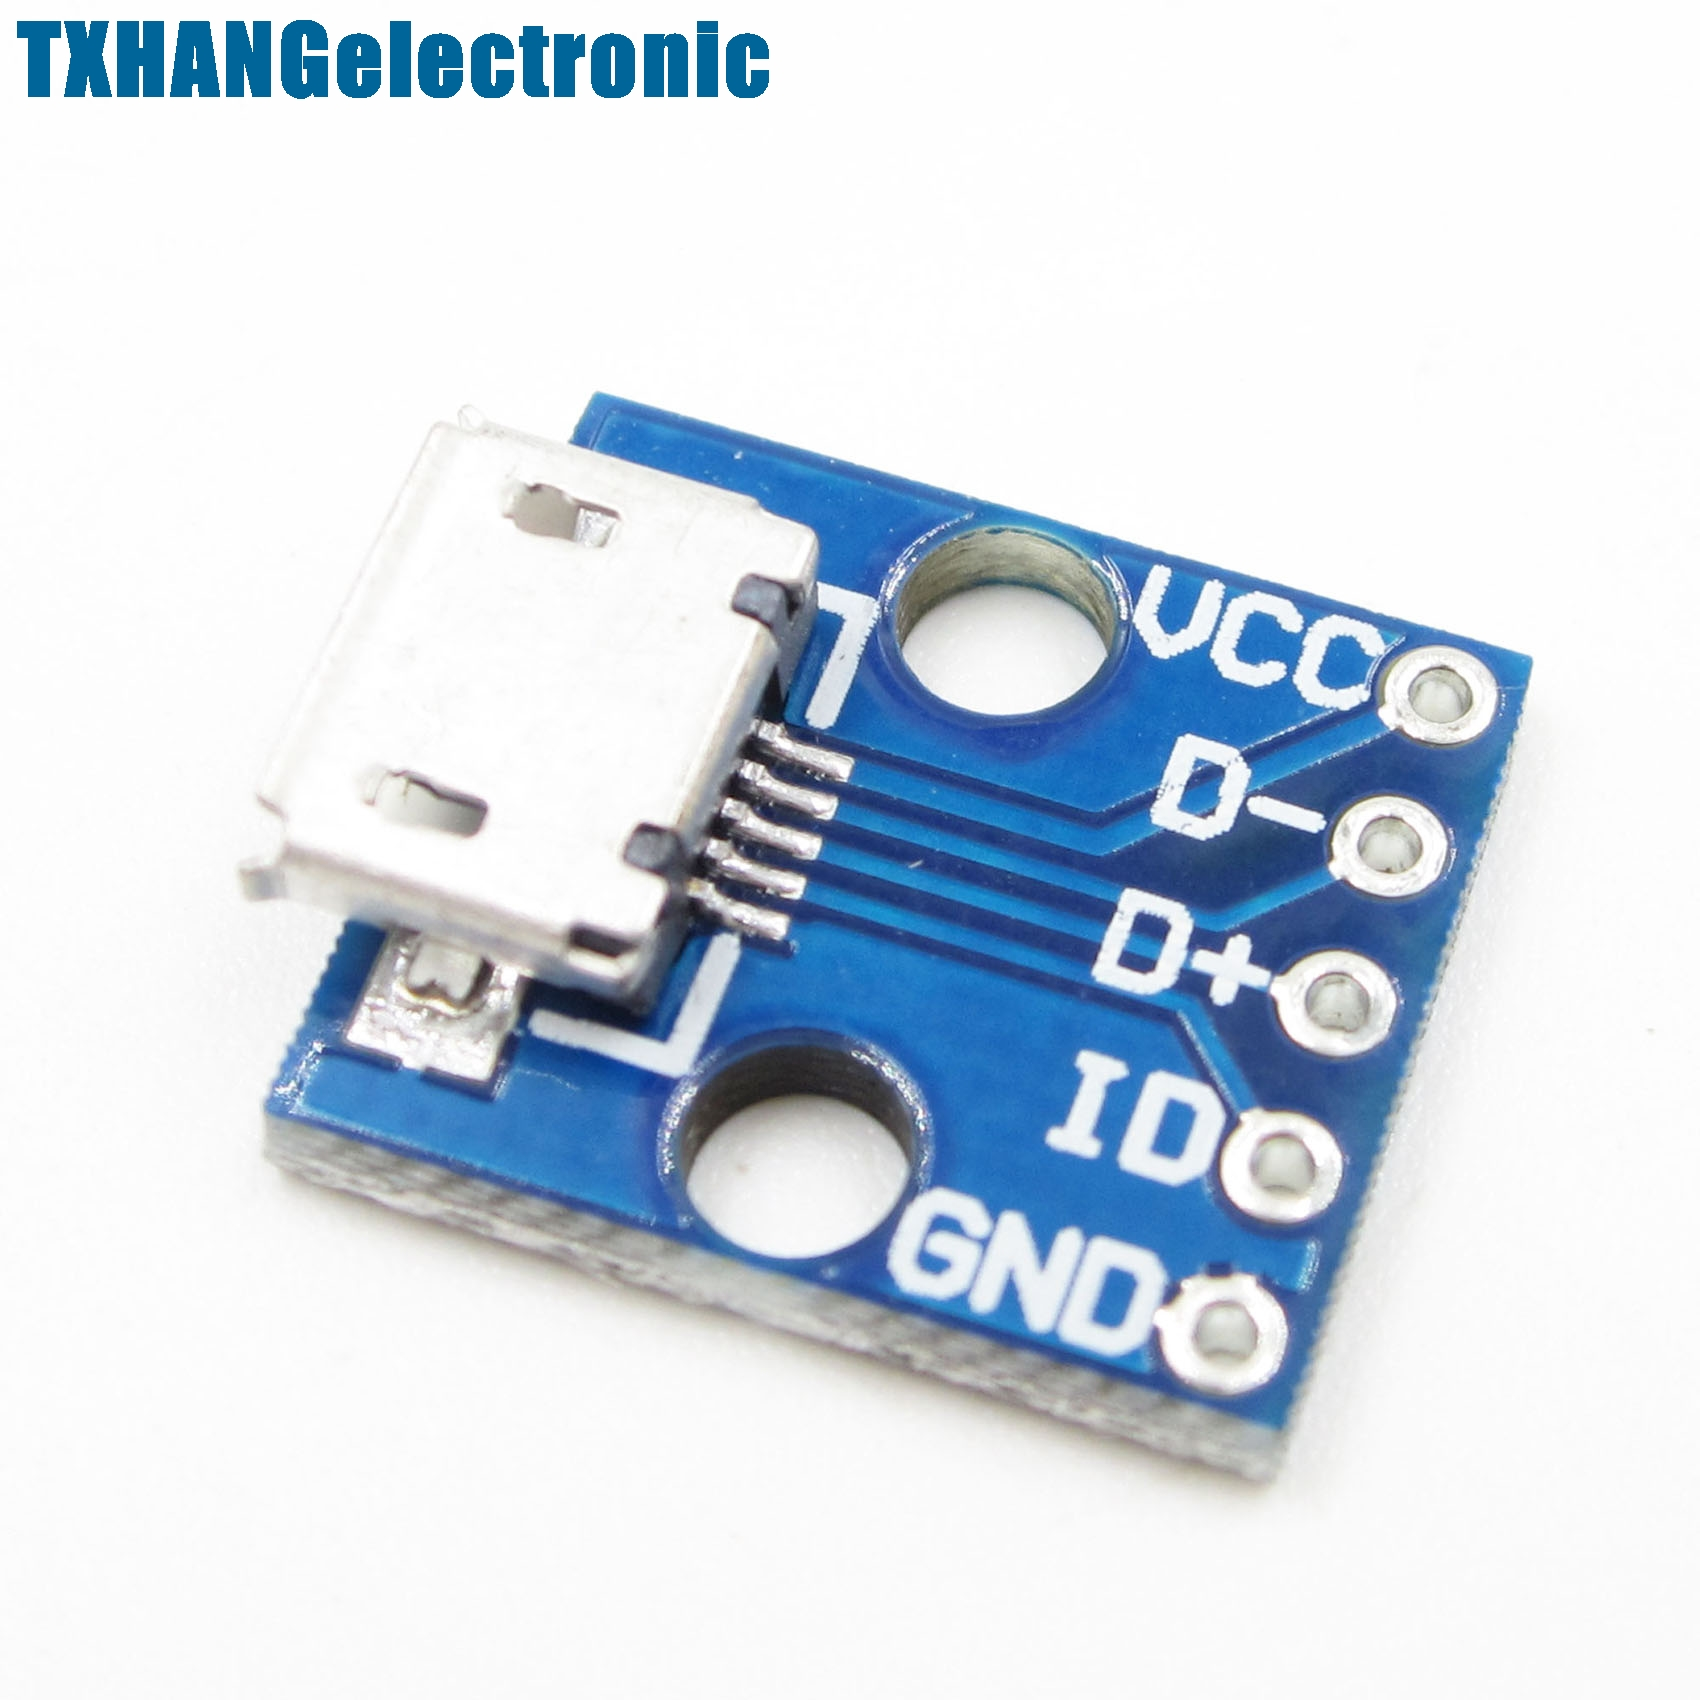 5Stks CJMCU Micro USB Interface Board Power Switch 5V Interface New